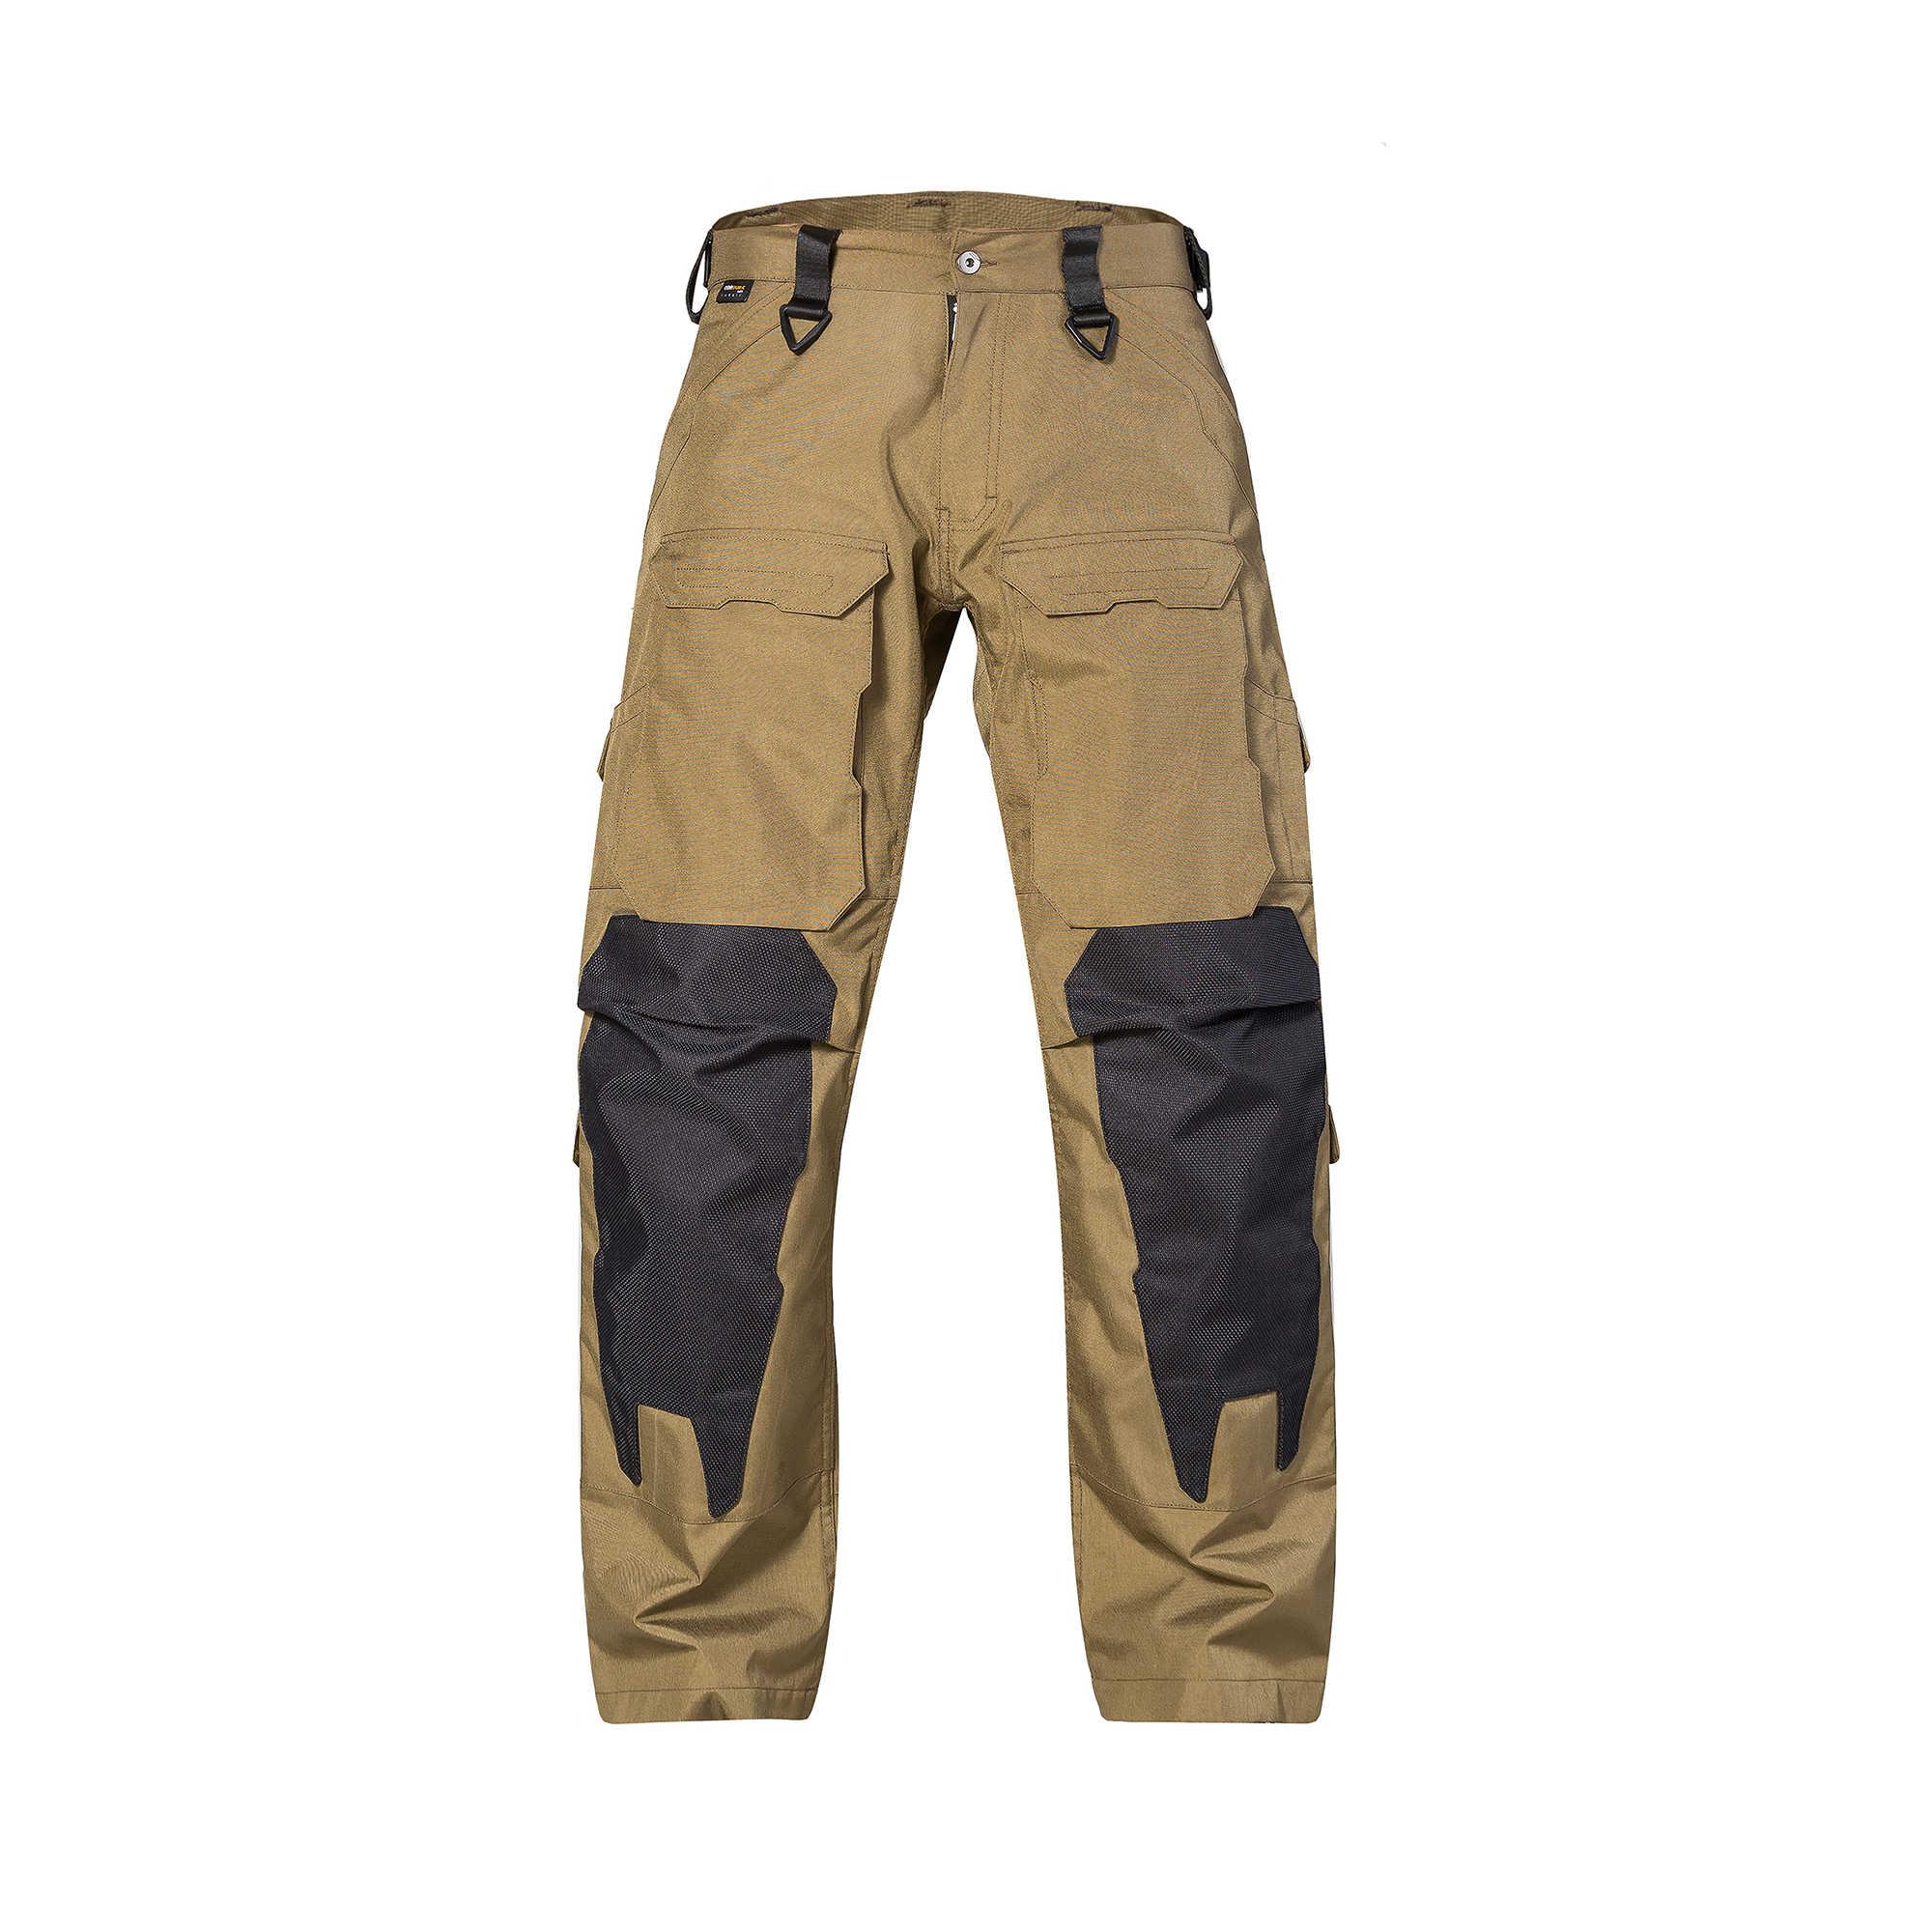 Pantalones Tacticos De Proteccion De Supervivencia Para Hombre Pantalones Masculinos De Vs I Color Marron Pantalones Informales Aliexpress